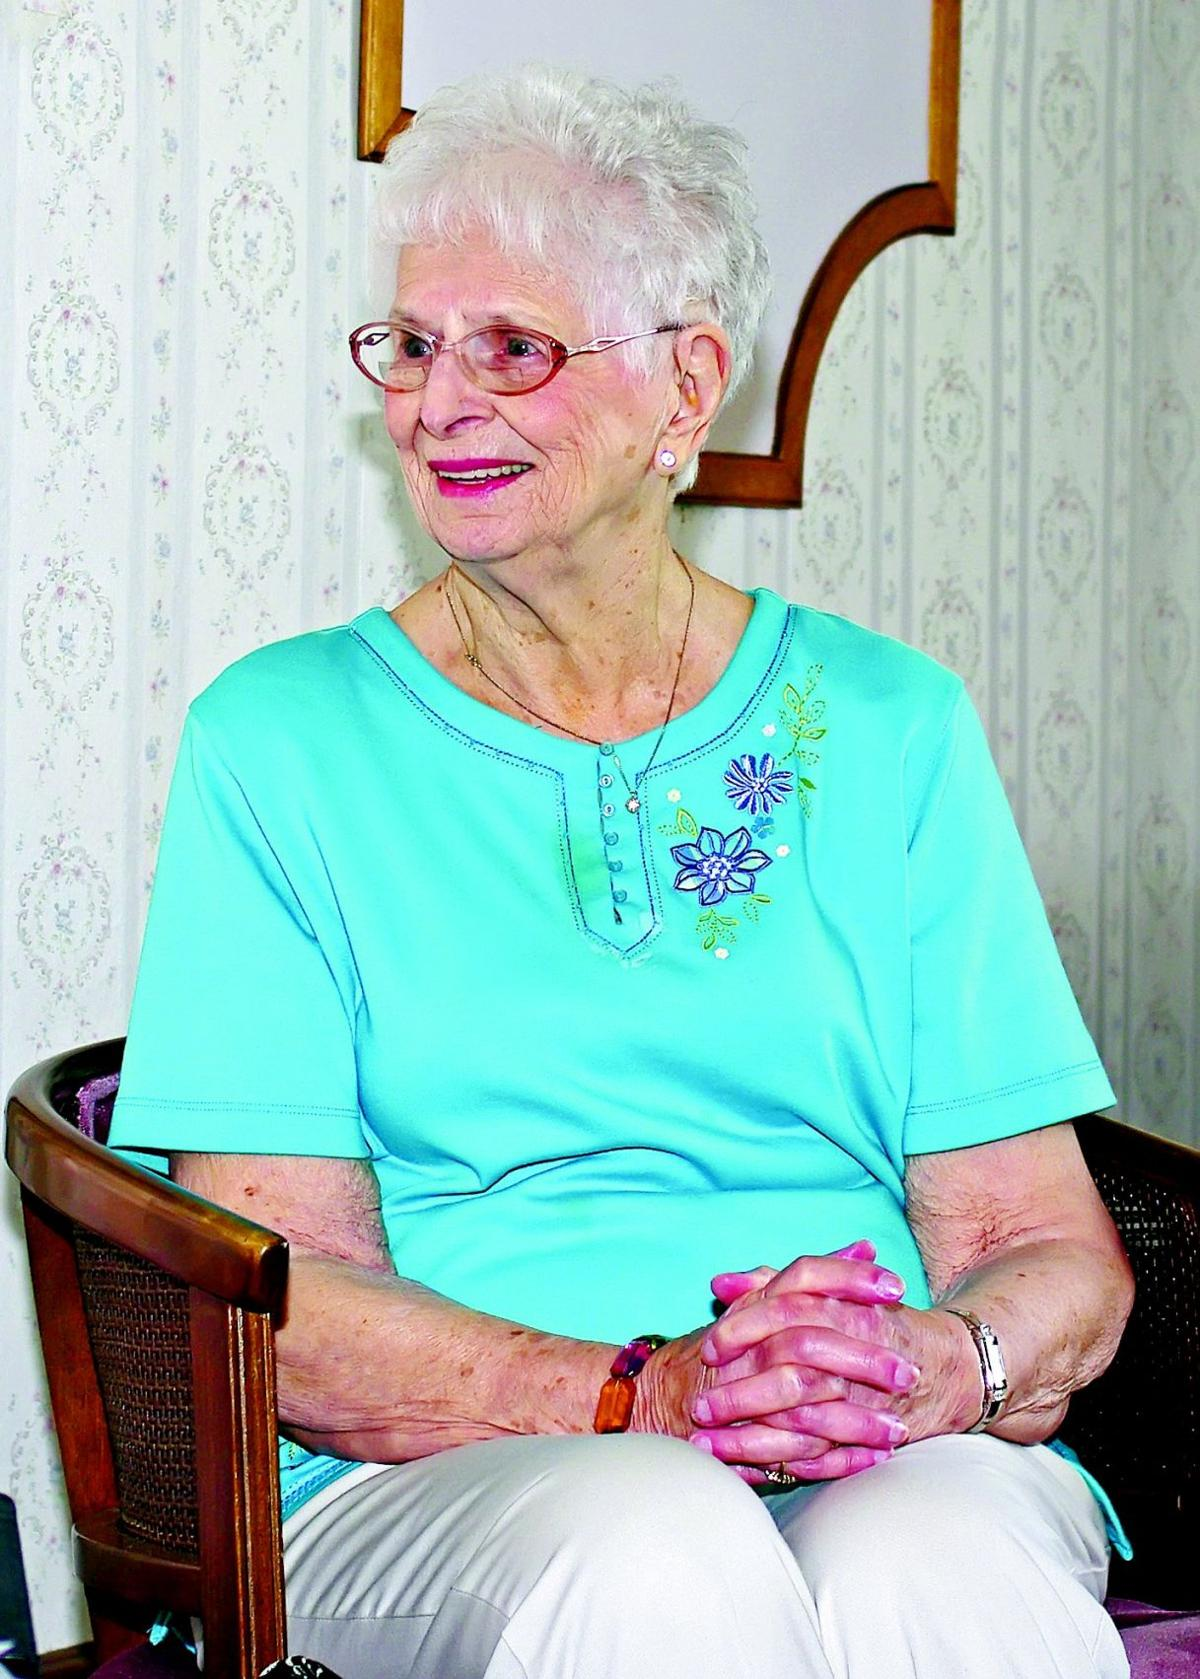 Family wants public to celebrate with Dorothea Ballard 95